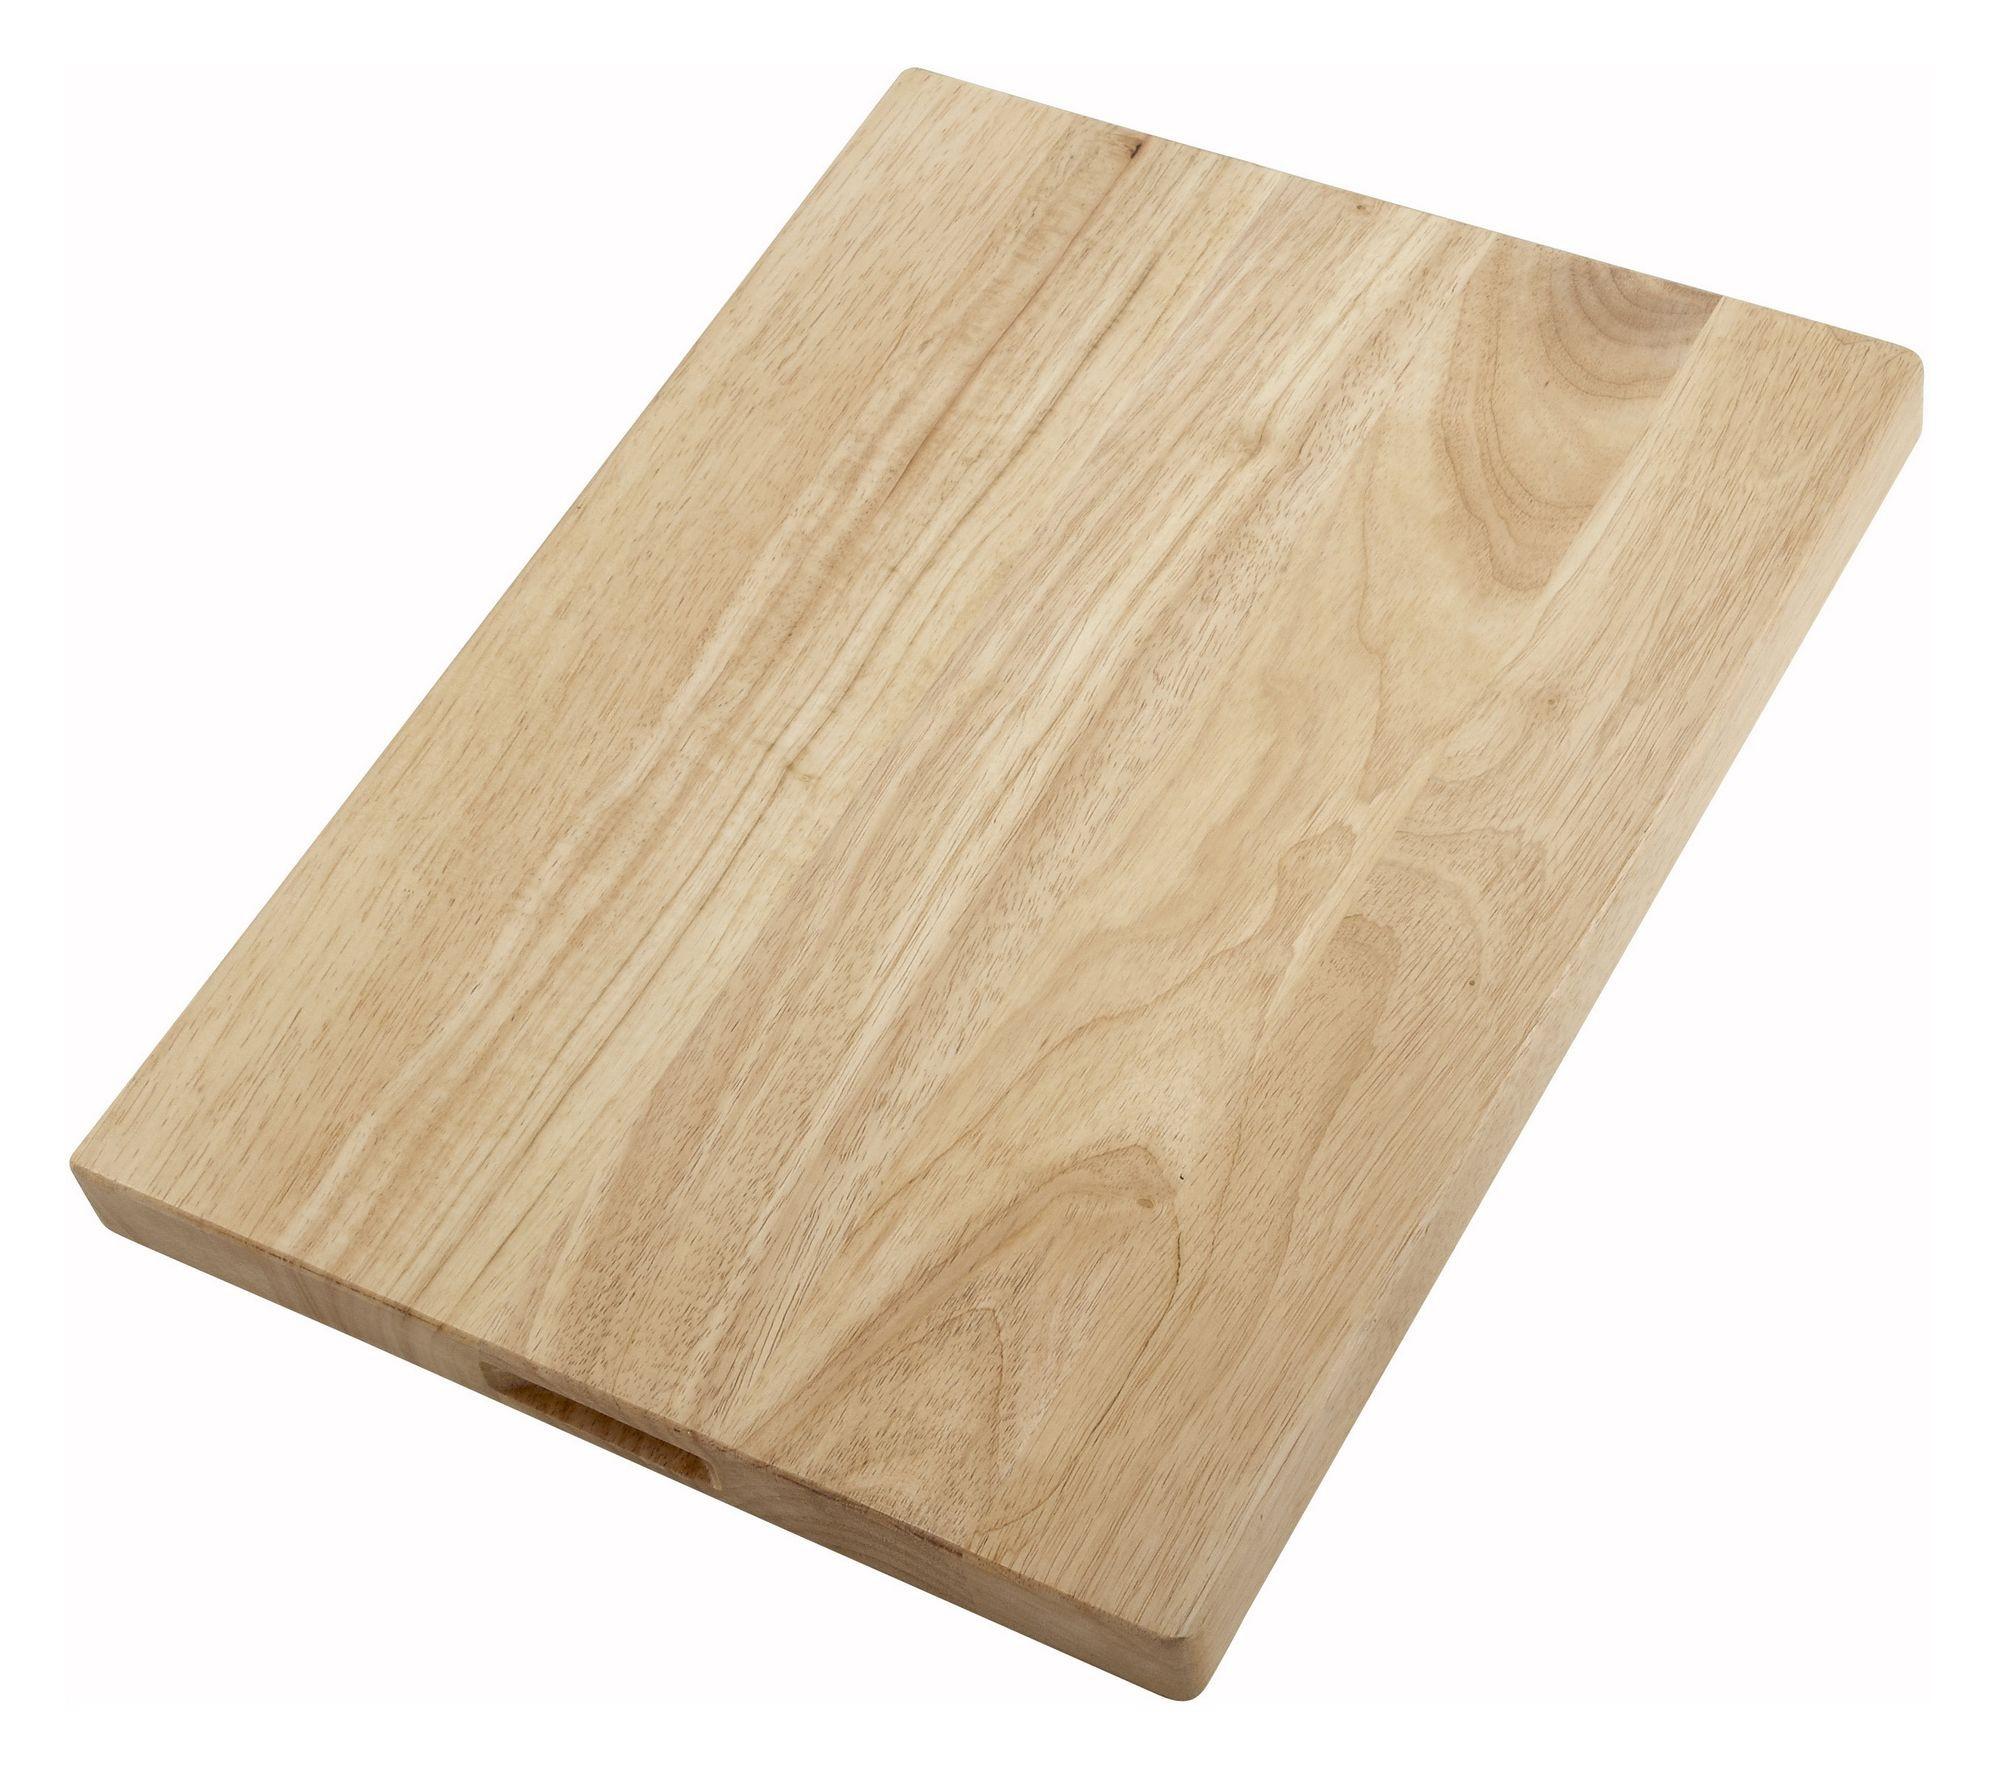 "Winco WCB-1824 Wood Cutting Board 18""x 24"" x 1-3/4"" Thick"